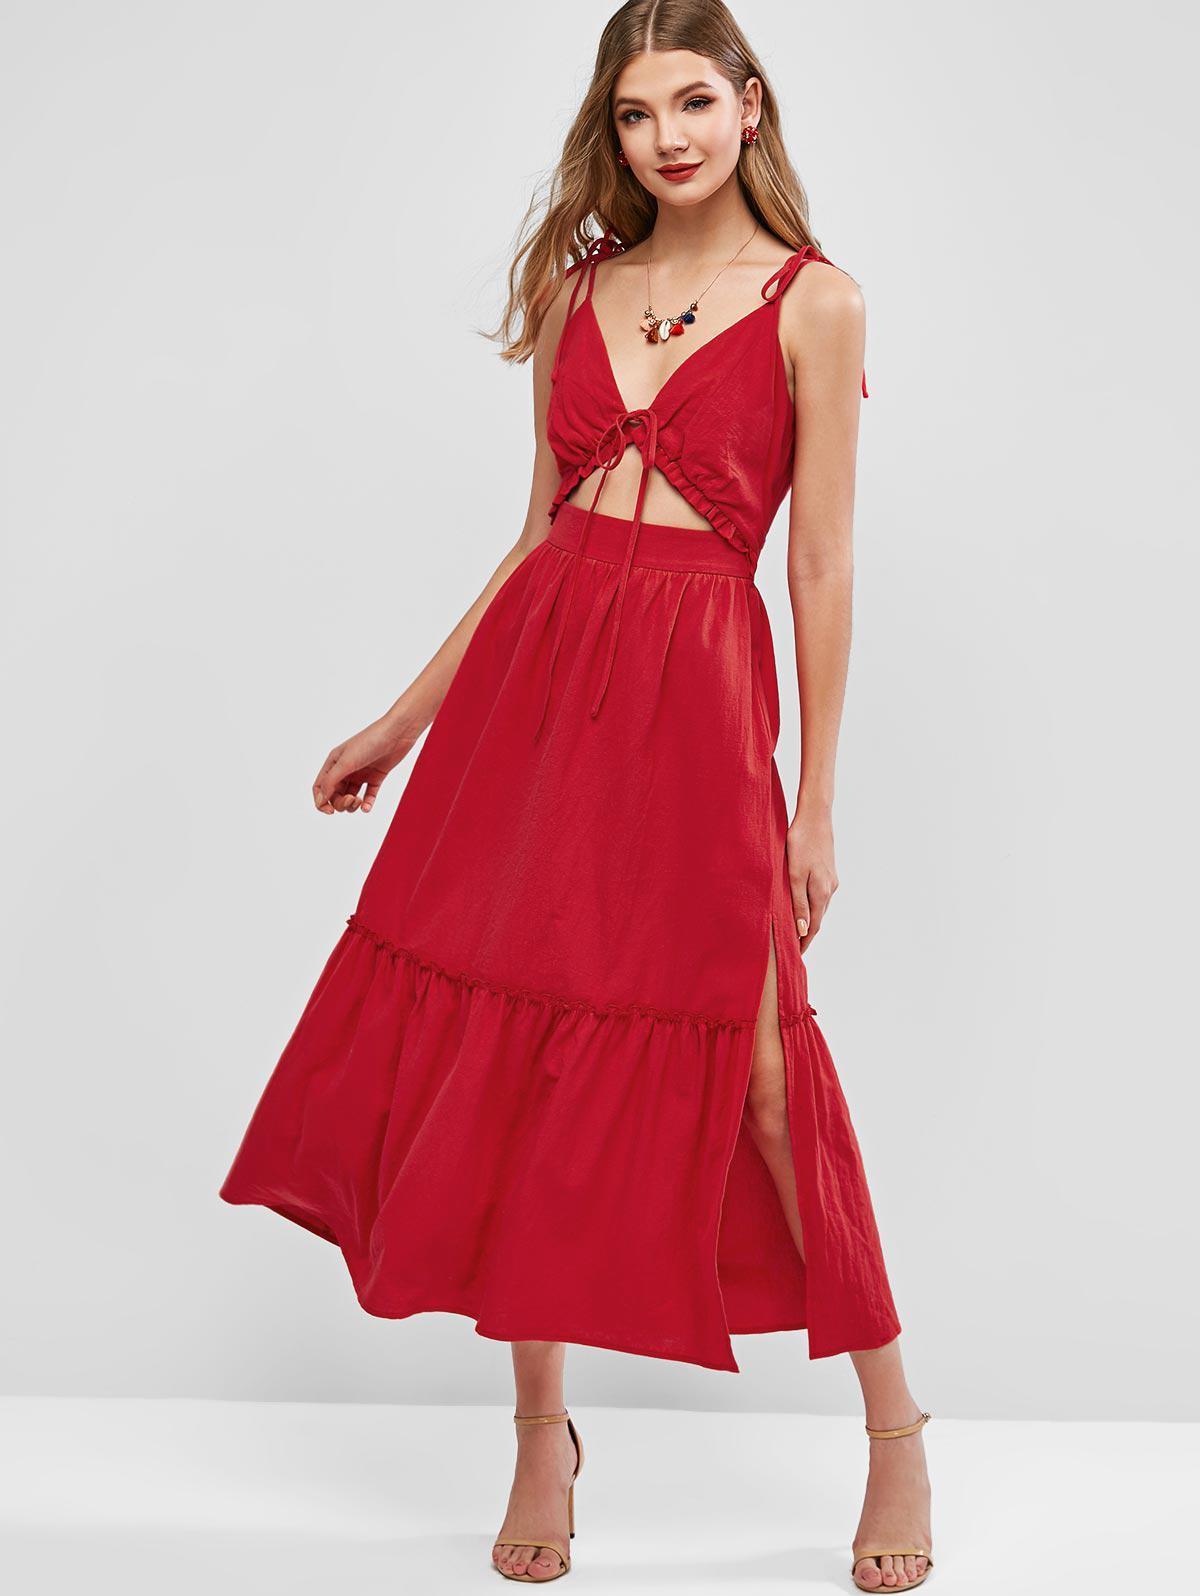 ZAFUL Cami Tie Front Tie Shoulder Slit Maxi Dress фото